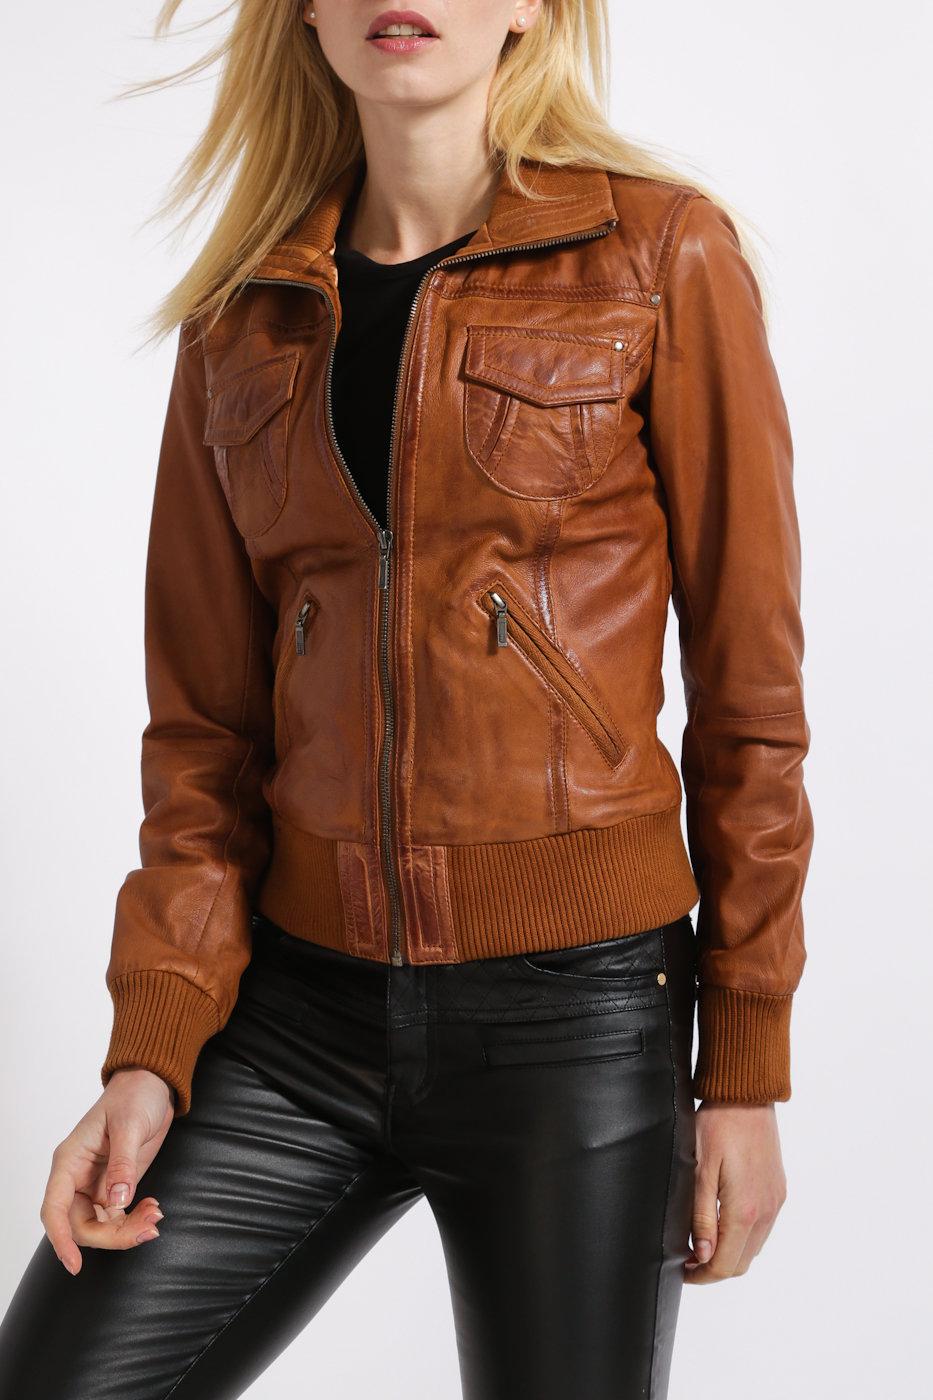 Кожаная куртка коричневая картинки